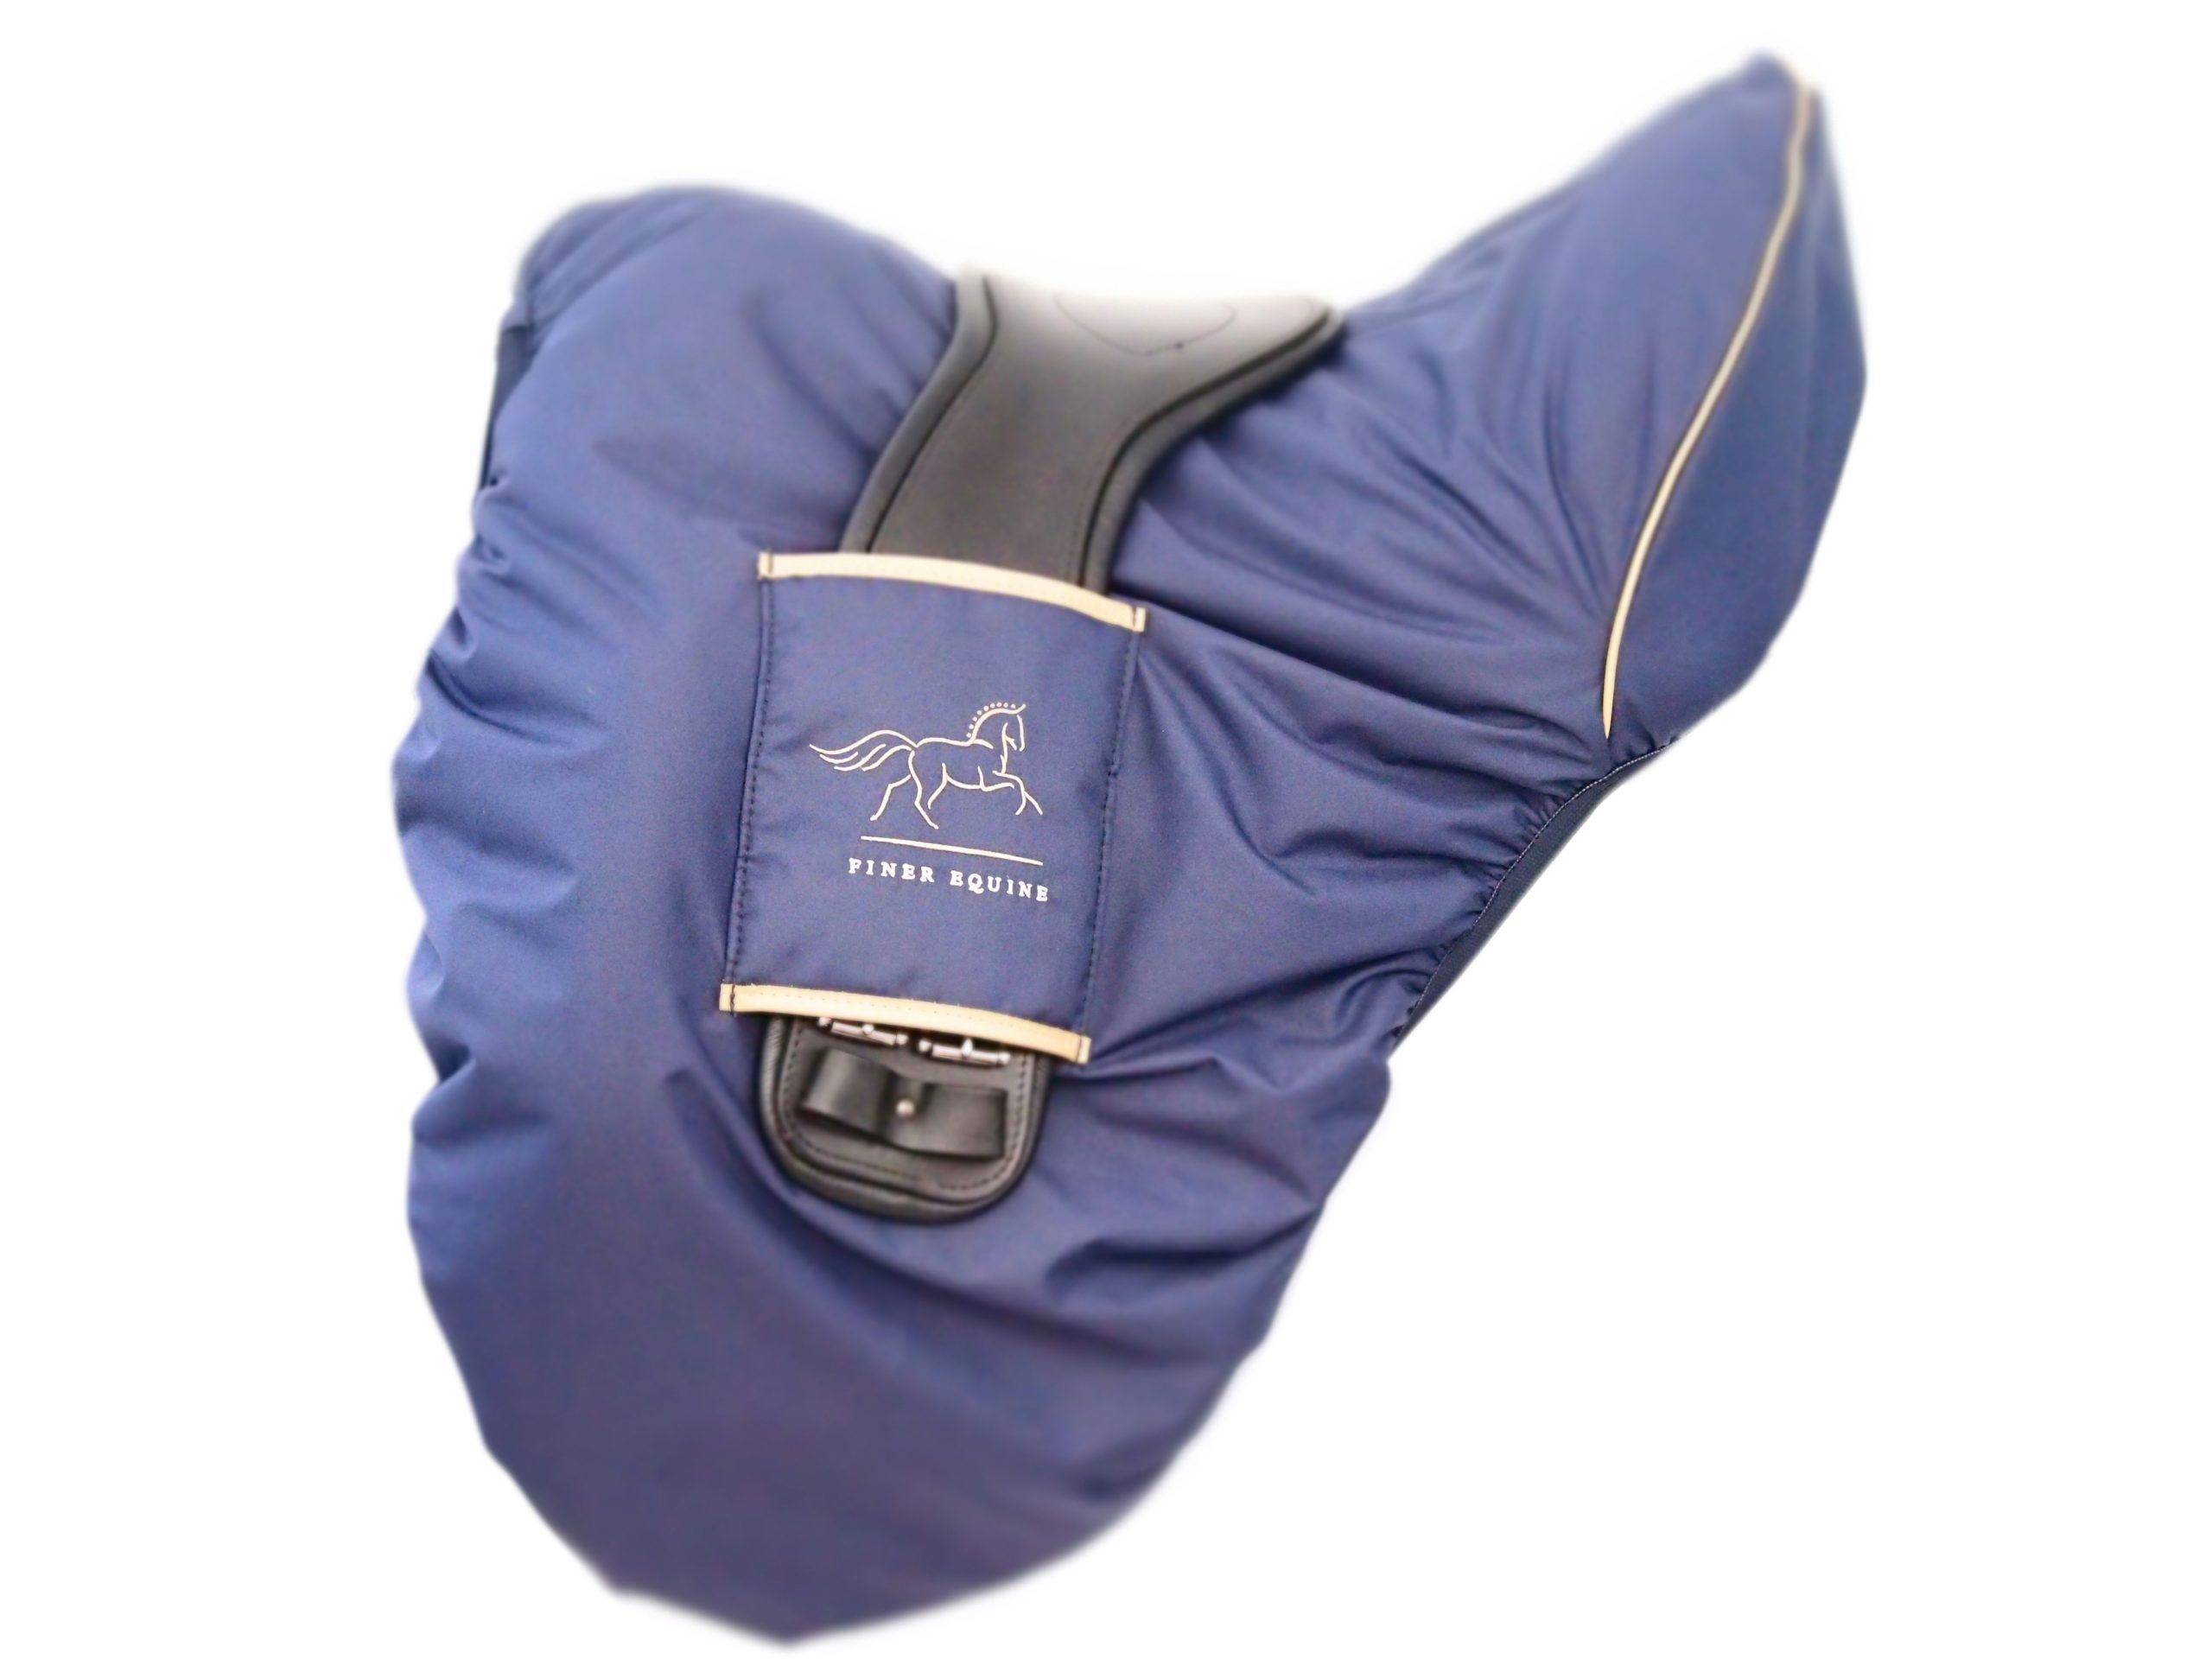 Finer Equine Saddle Cover Boudica Equestrian In 2021 Saddle Cover Dressage Fashion Bridle Bag